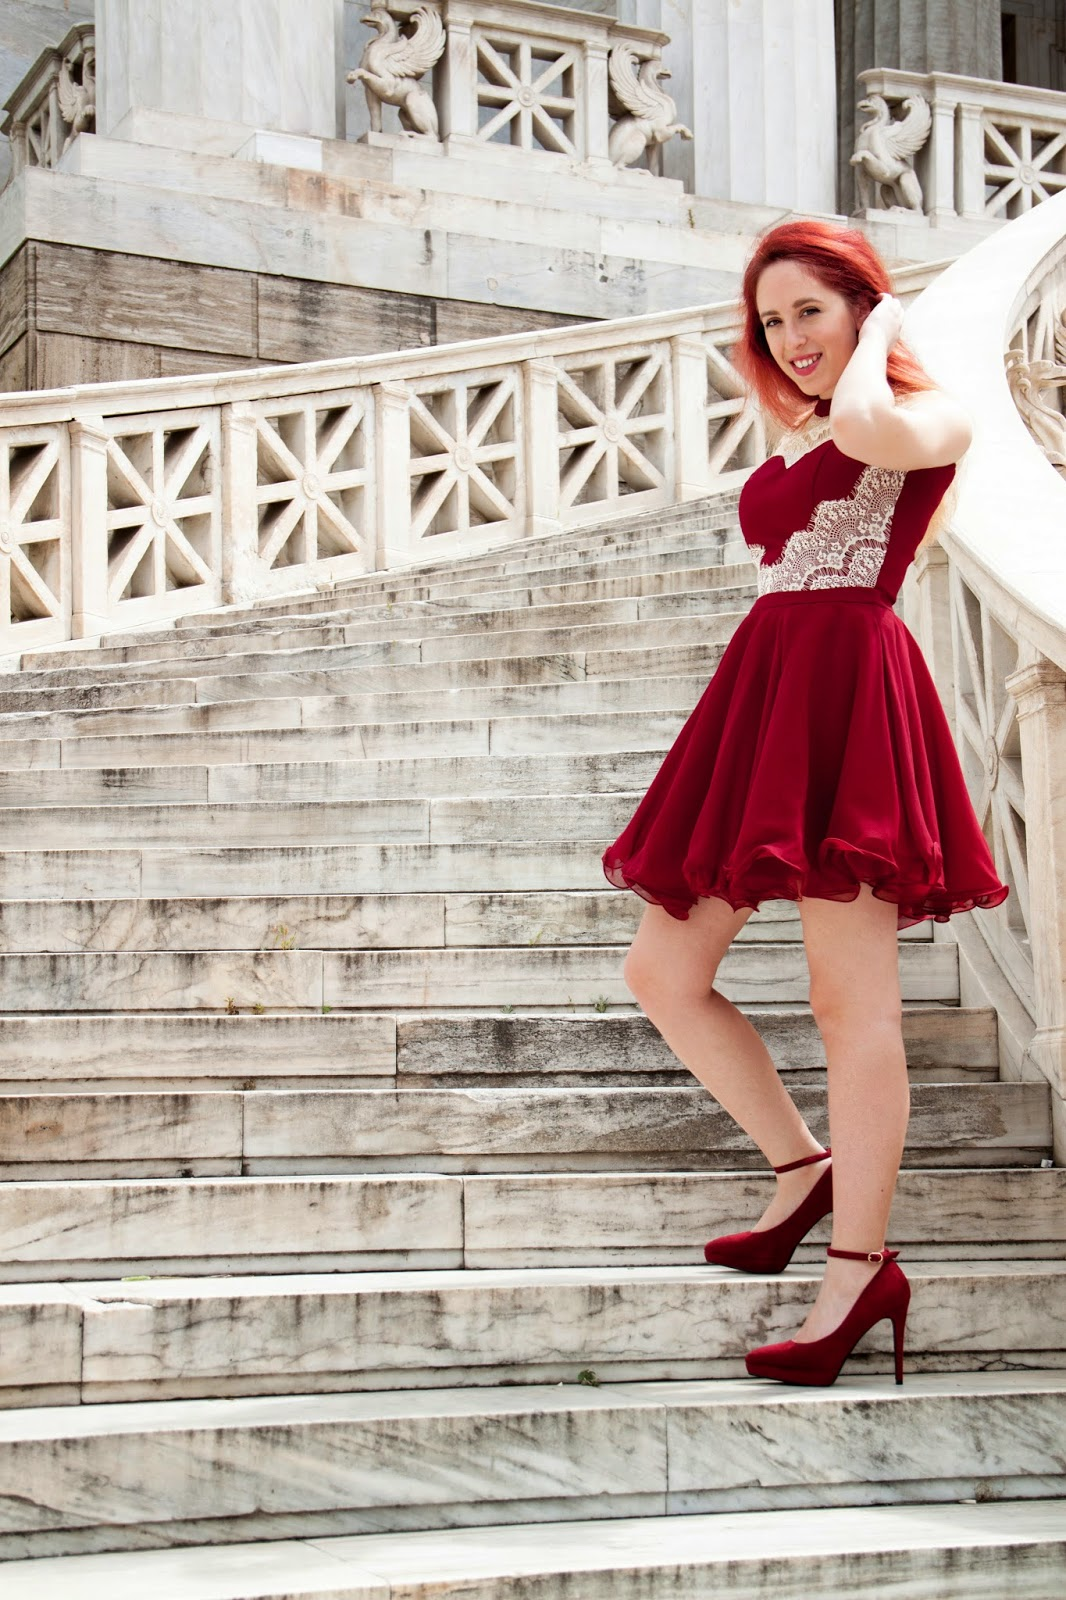 Redhead, spotlights on the redhead, clothes, Anna Keni, Anna, fashion, blogger, fashion blogger, review, red, dress, model, hot,royals, photoshoot, mini, chichi,felicity